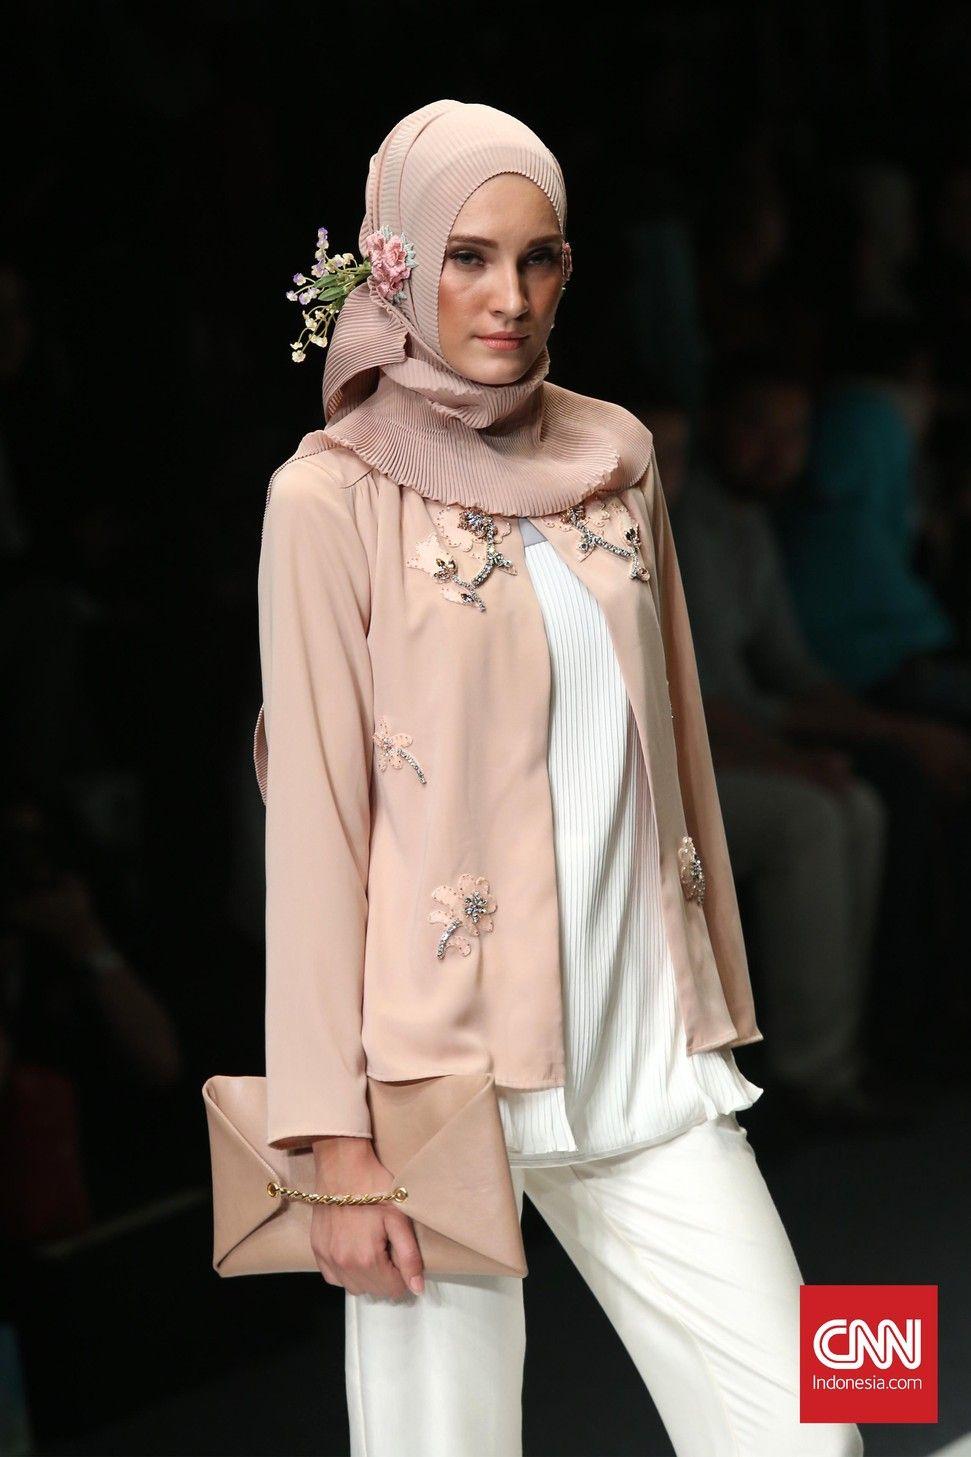 Nuansa Bening Busana Hijab di Jakarta Fashion Week 10  Gaya